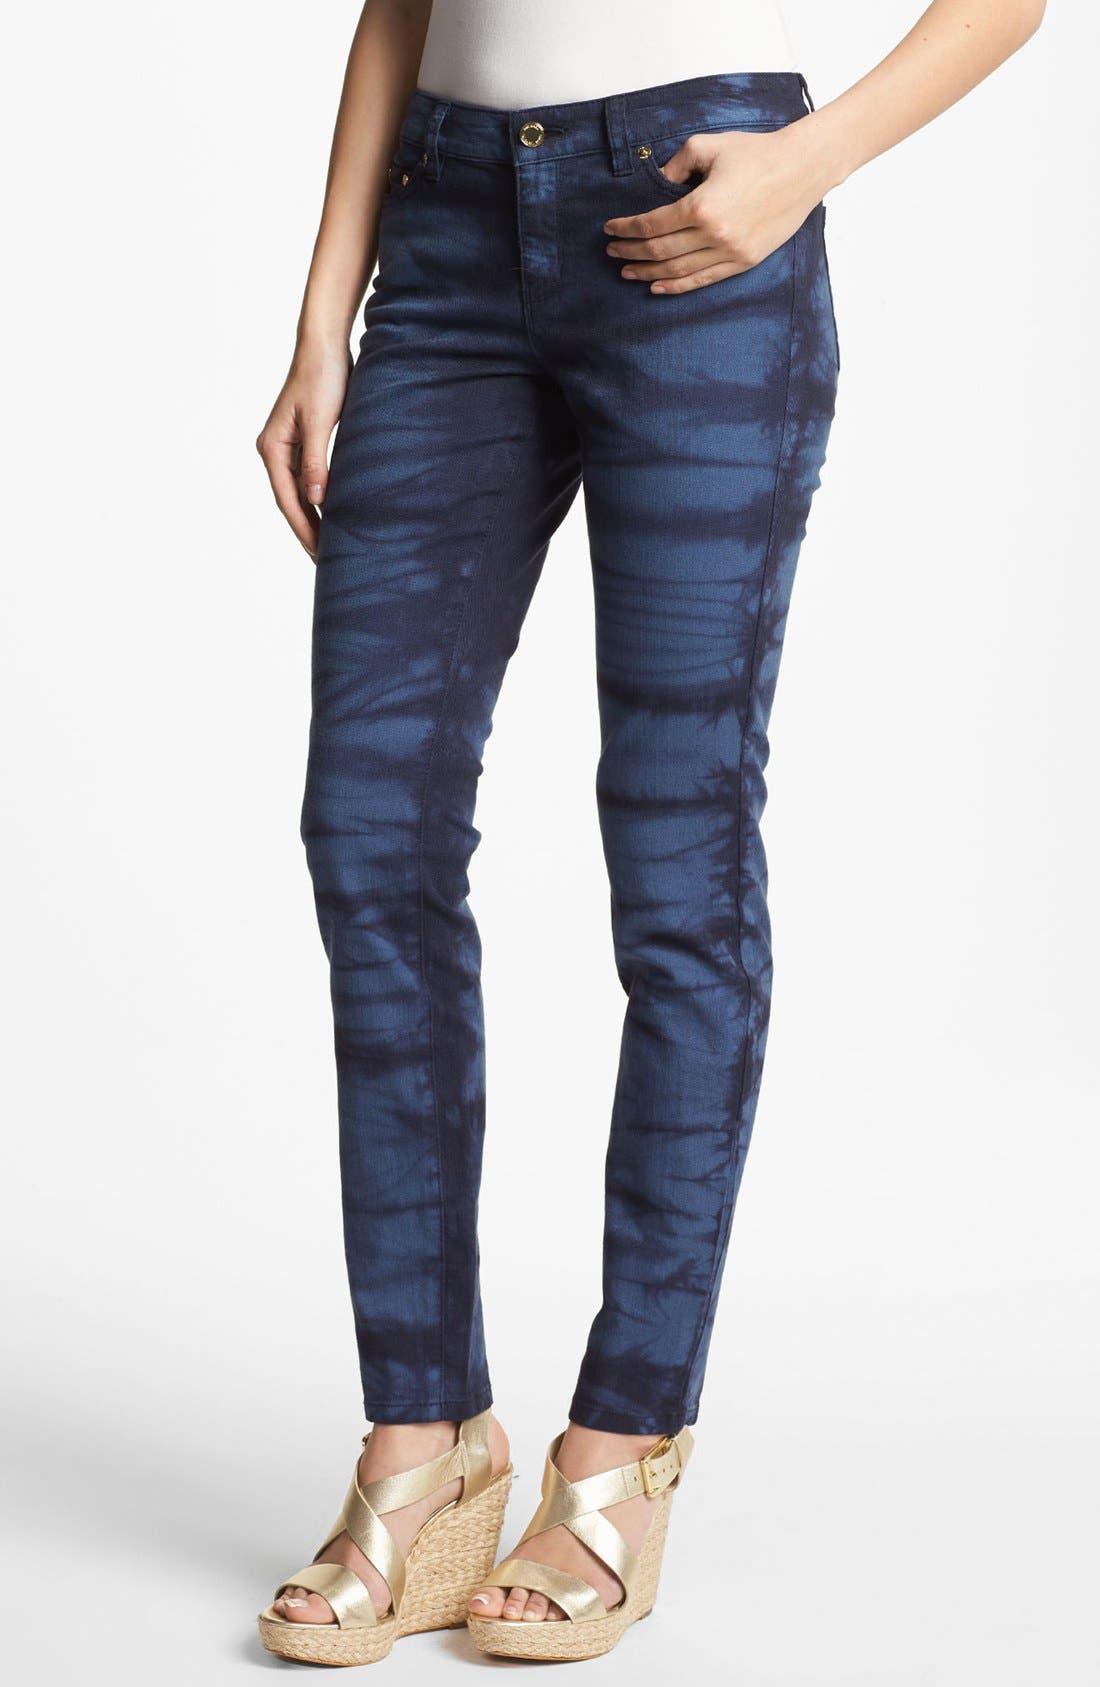 Main Image - MICHAEL Michael Kors Tie Dye Print Jeans